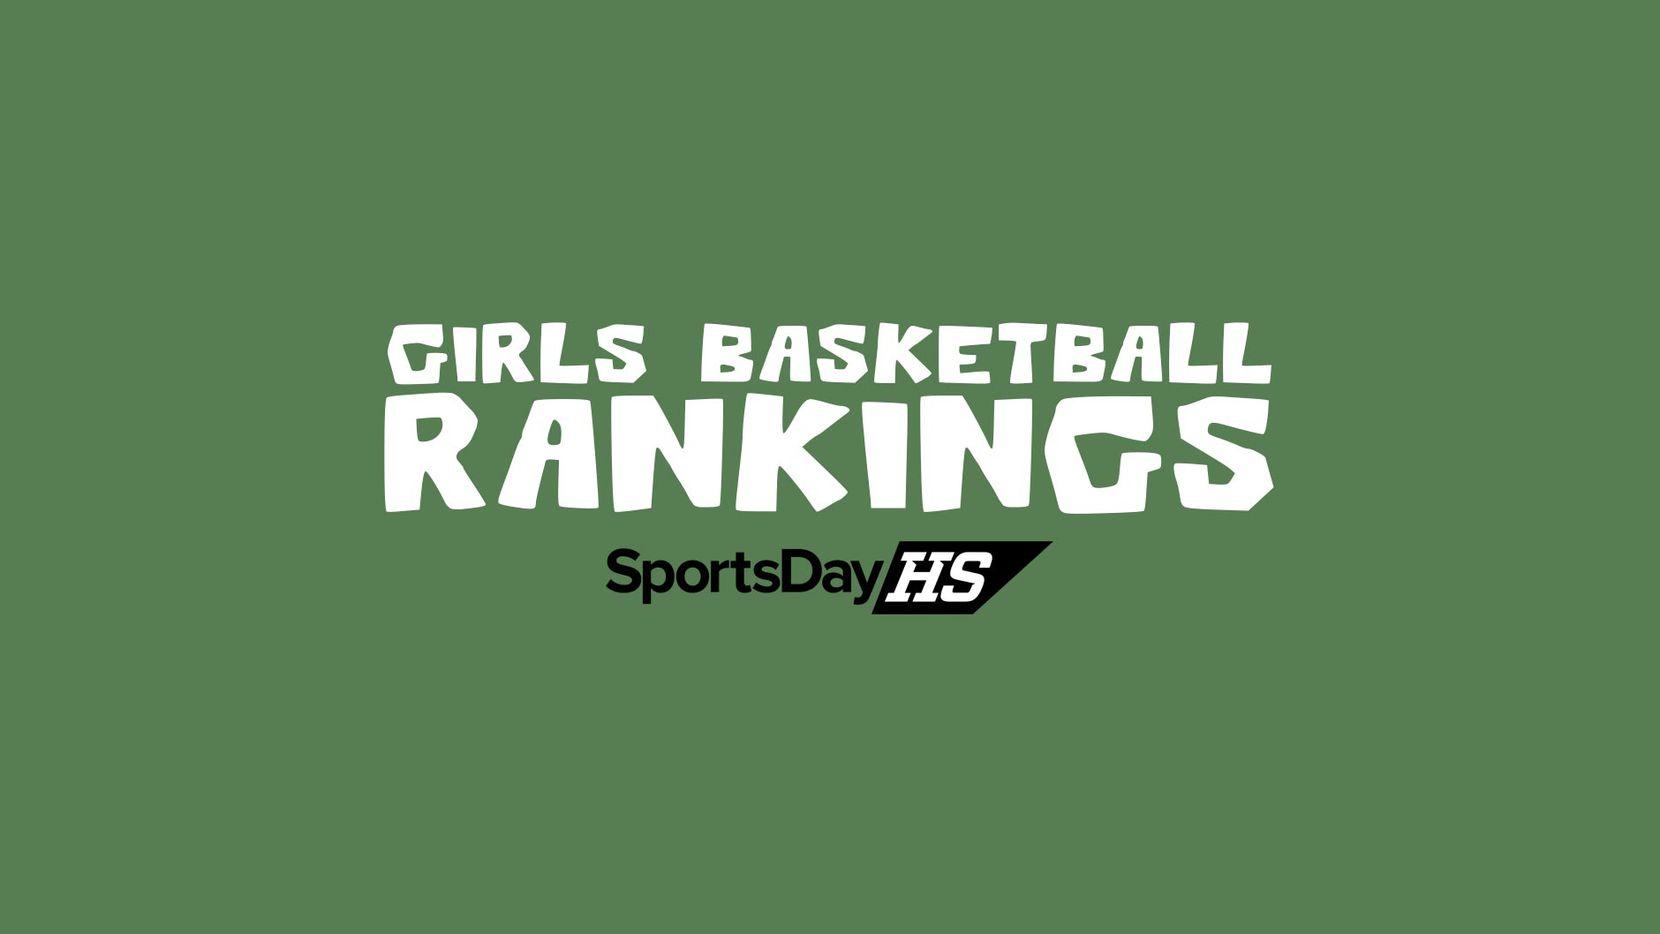 Girls basketball rankings.